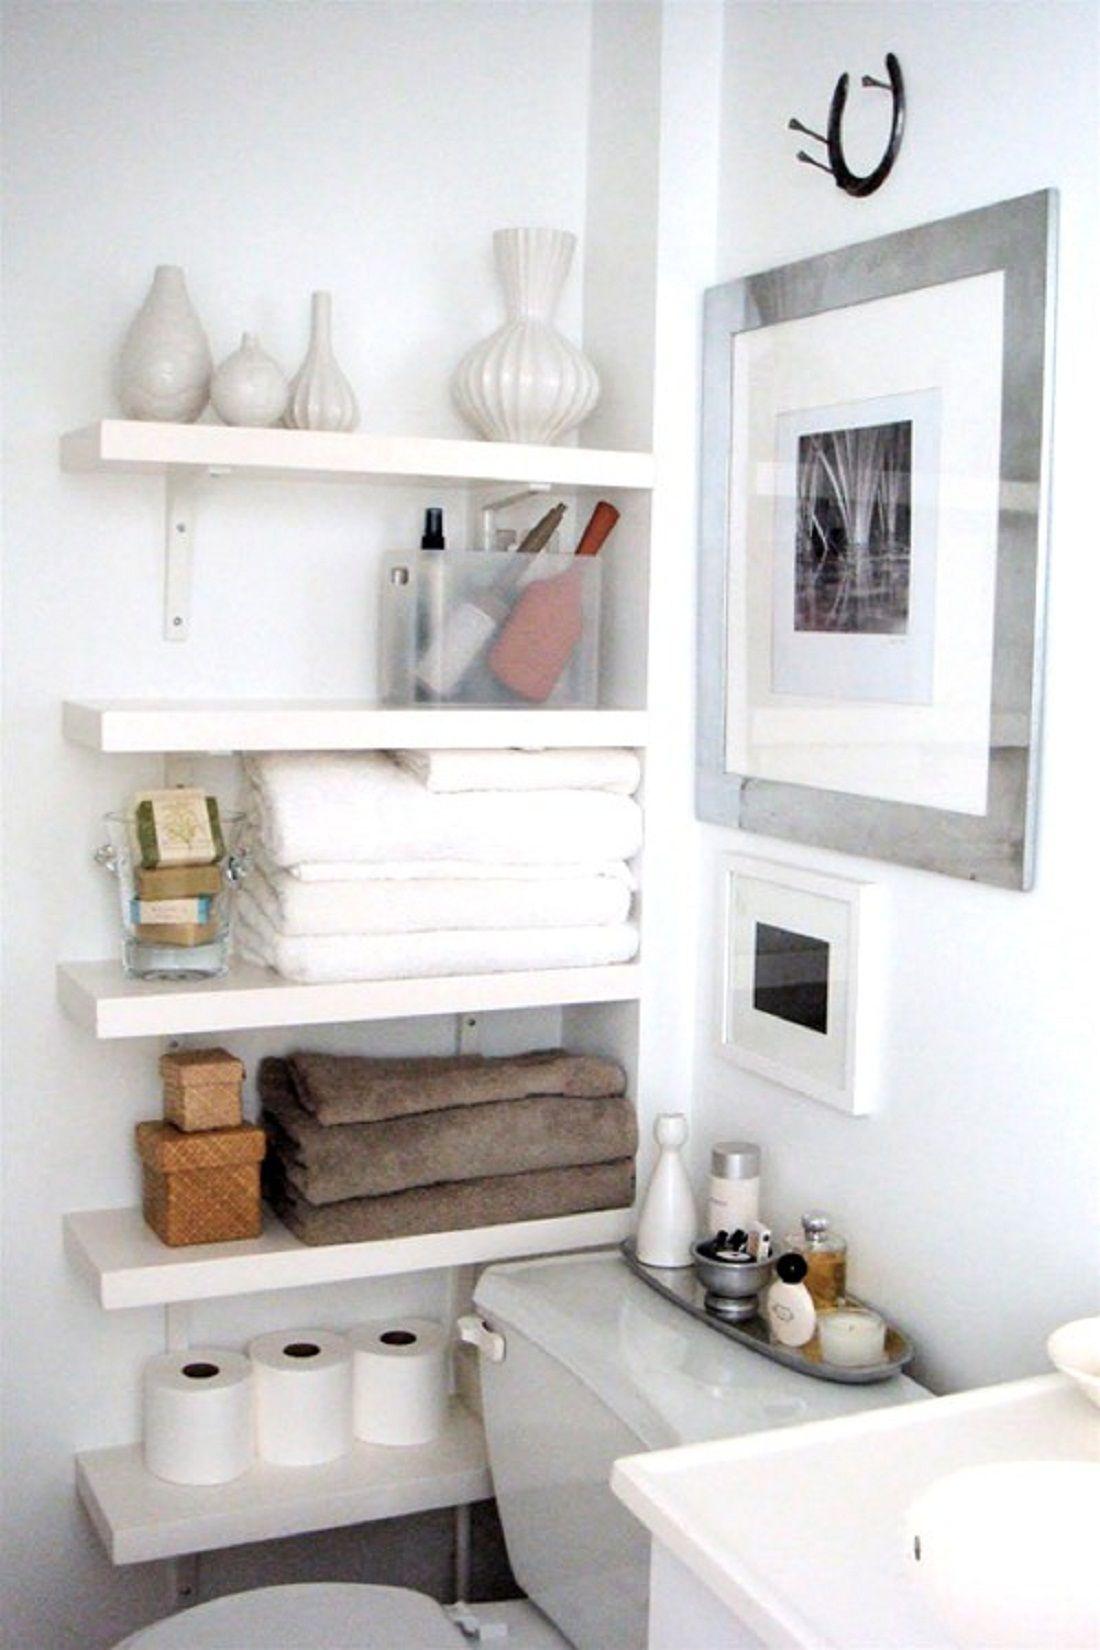 Practical Bathroom Storage Ideas Decor Home Home Decor Practical bathroom organization ideas